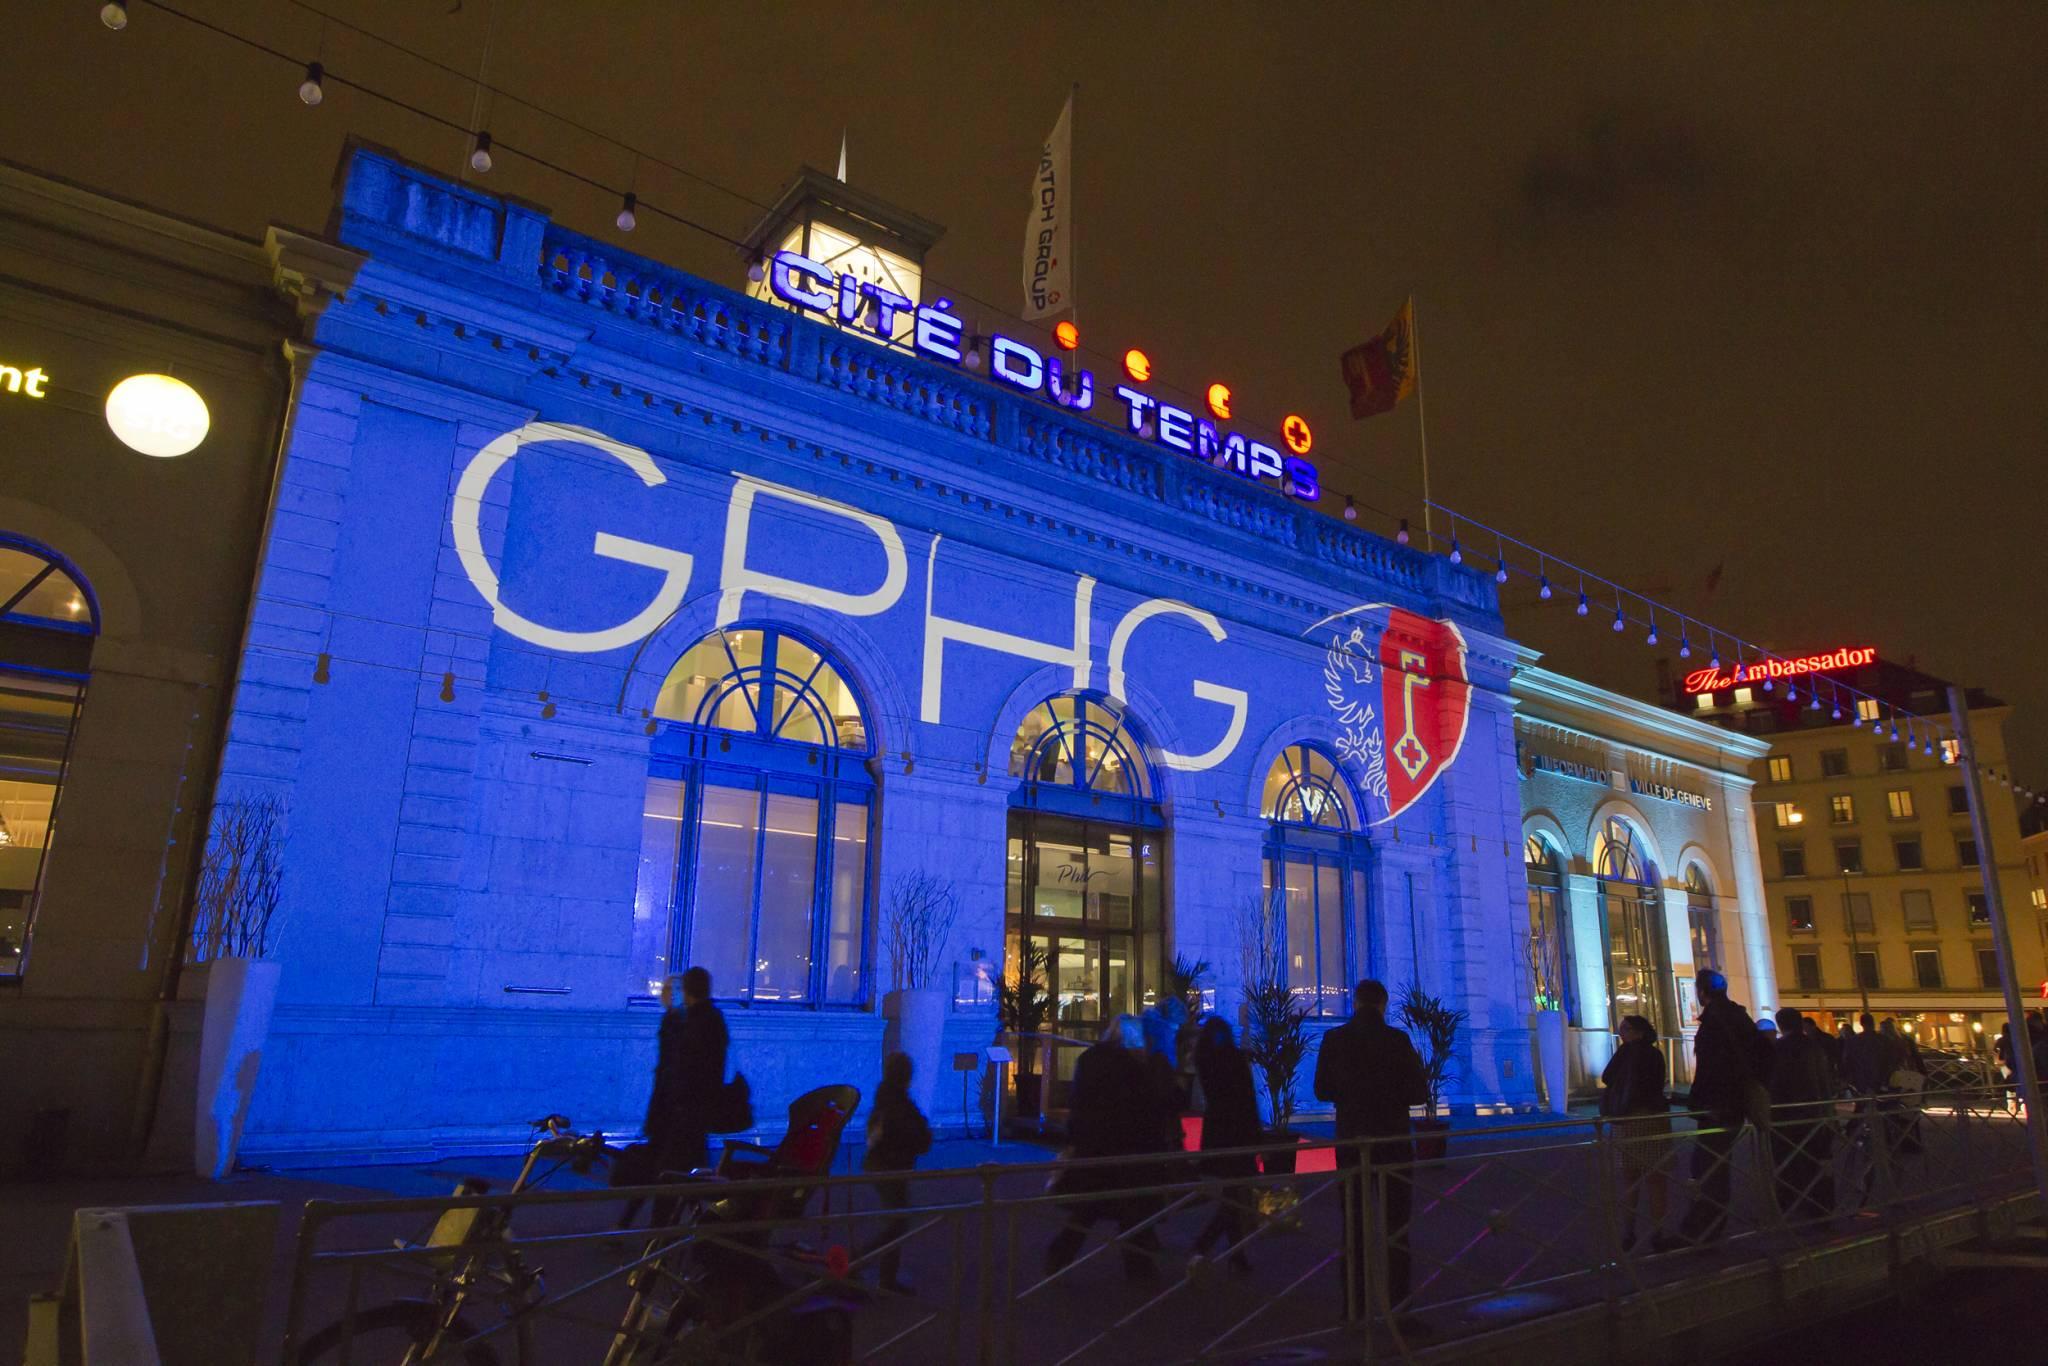 The Cité du Temps illuminated during the Geneva exhibition, November 8th, 2011